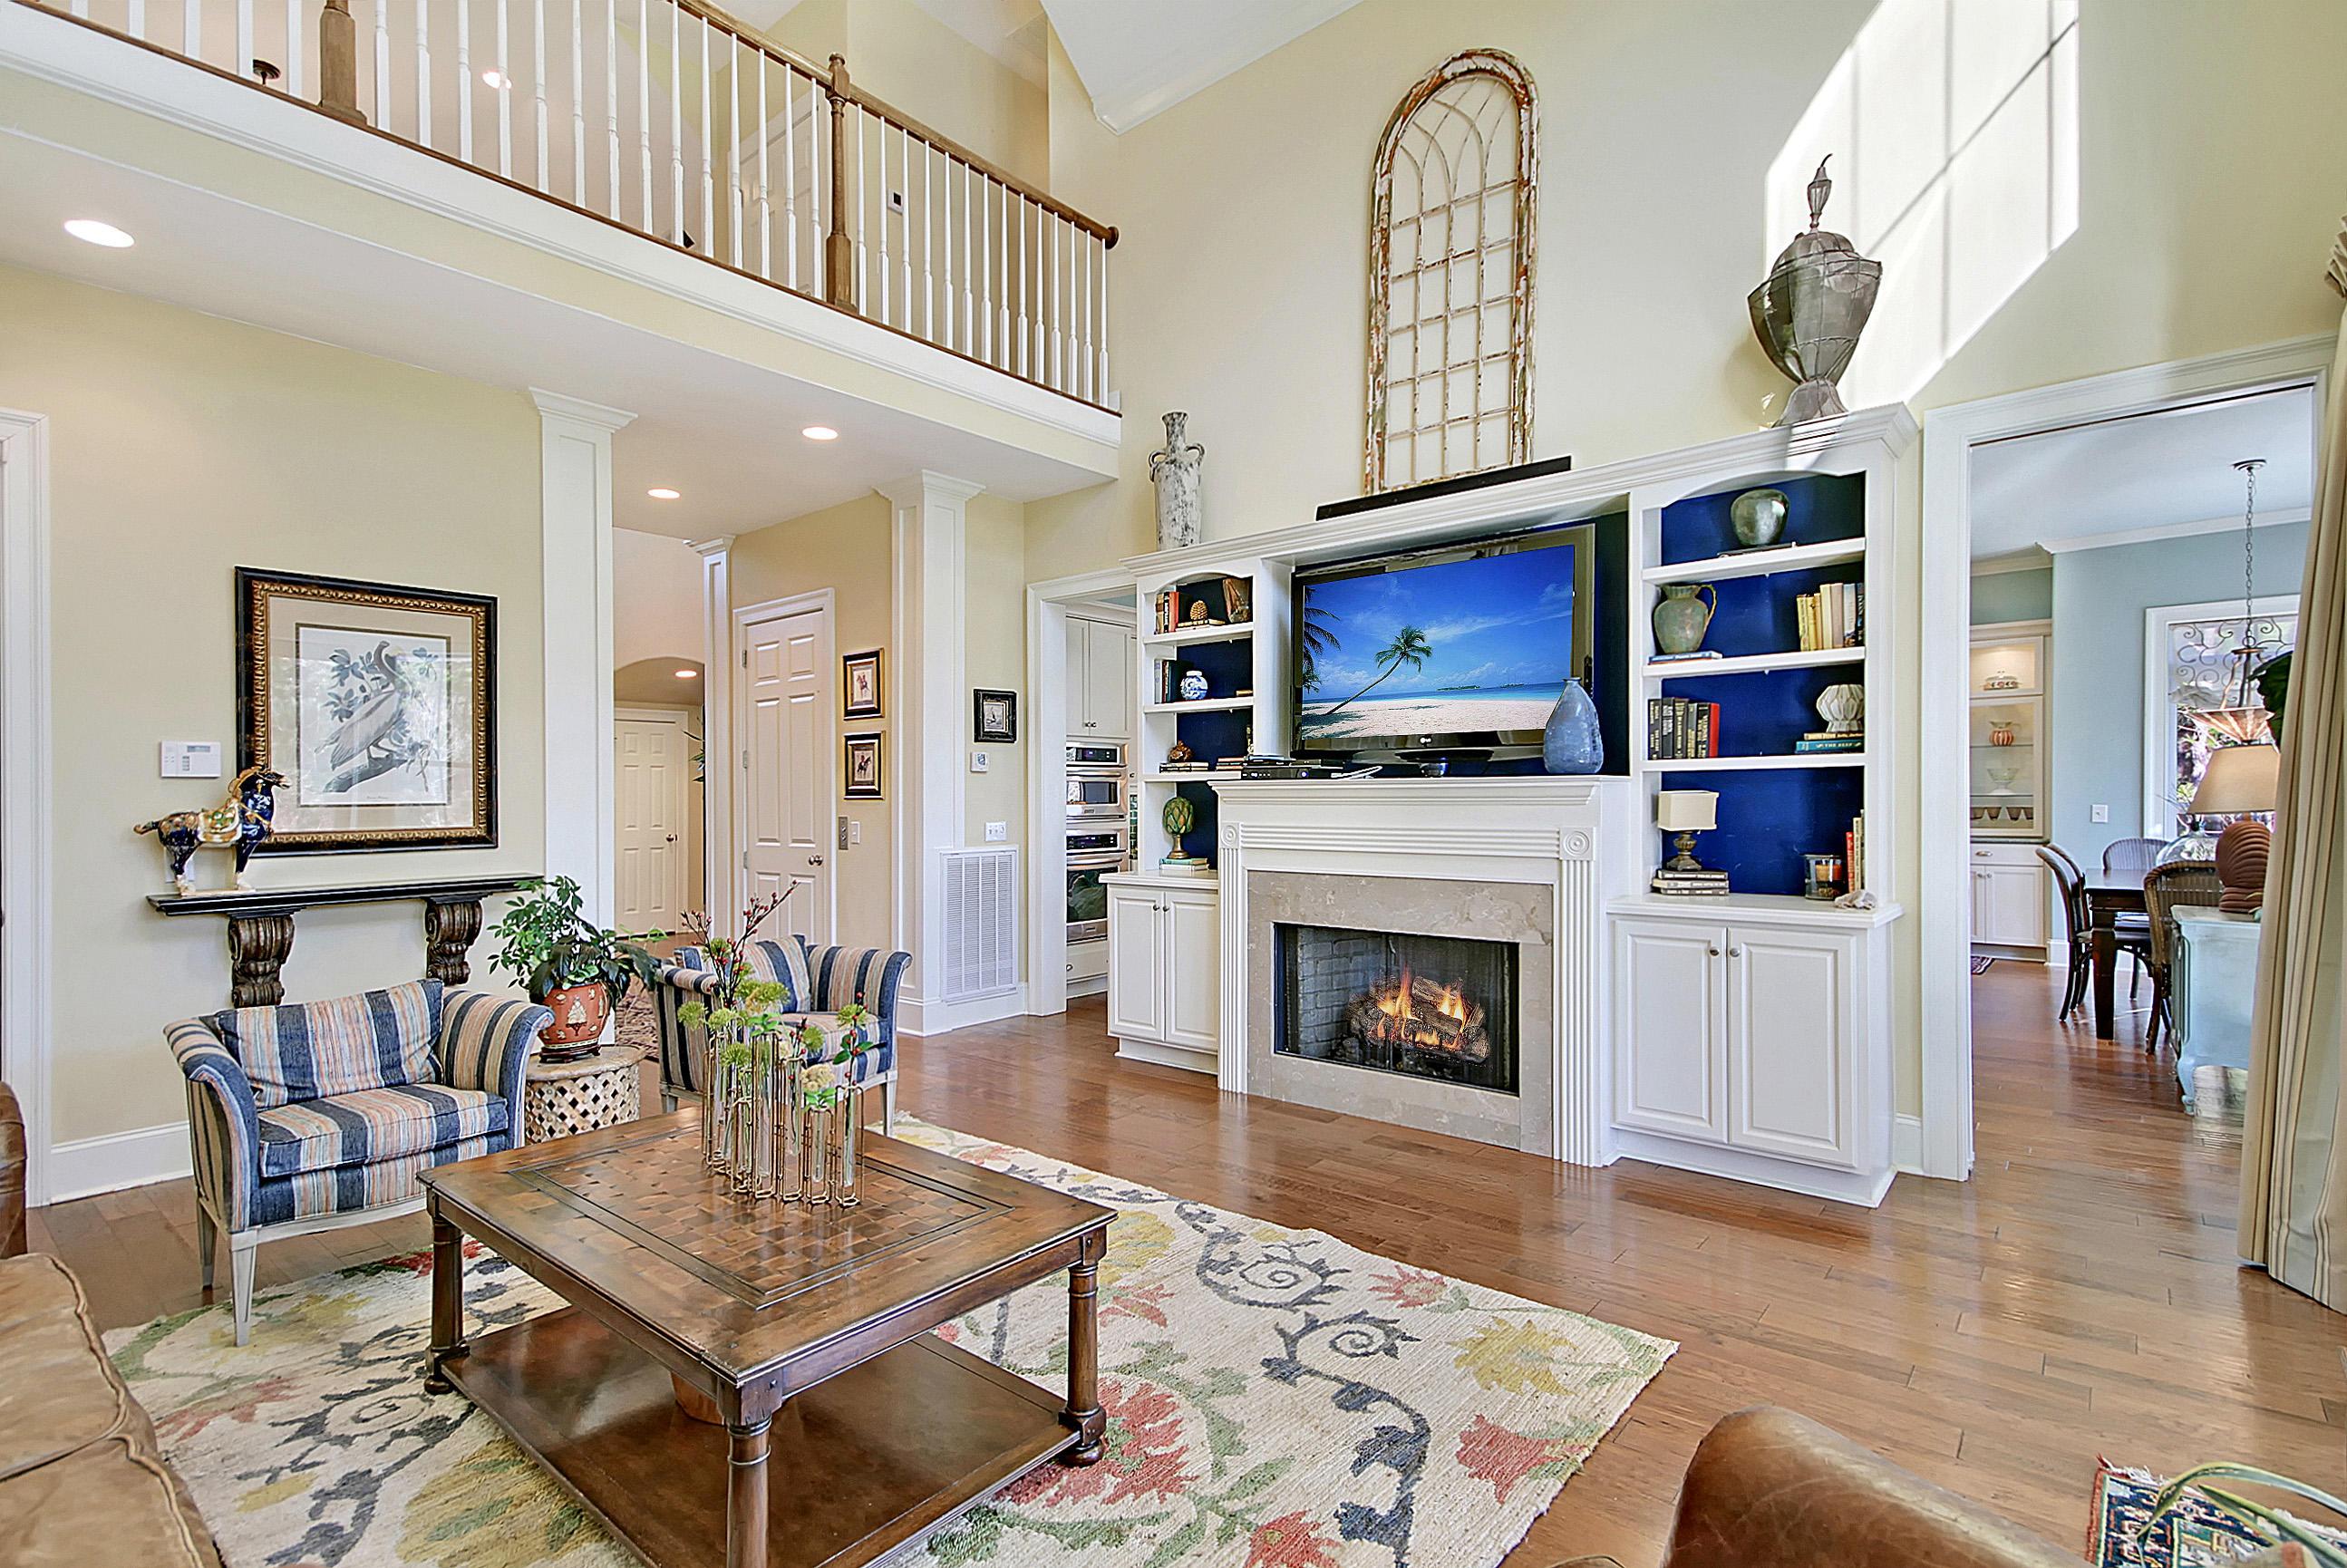 Rivertowne Country Club Homes For Sale - 2601 Kiln Creek, Mount Pleasant, SC - 72